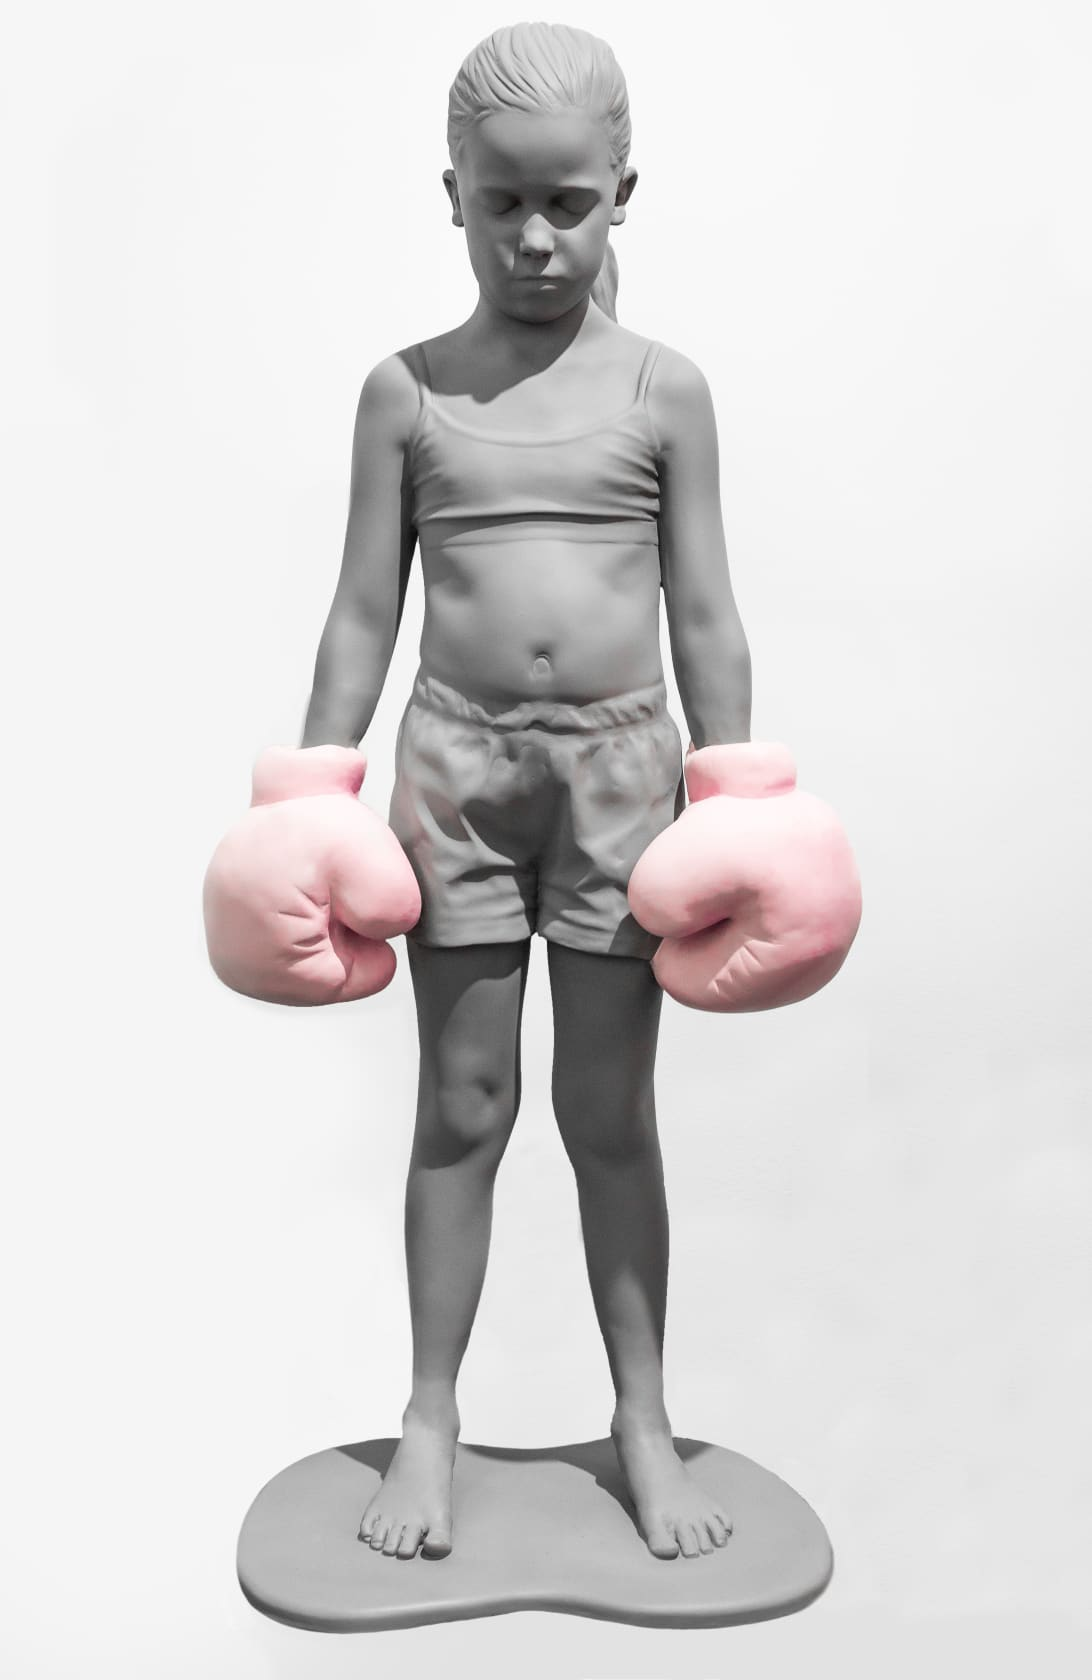 Schoony Bruiser (Pink Gloves) Wood and Fibreglass